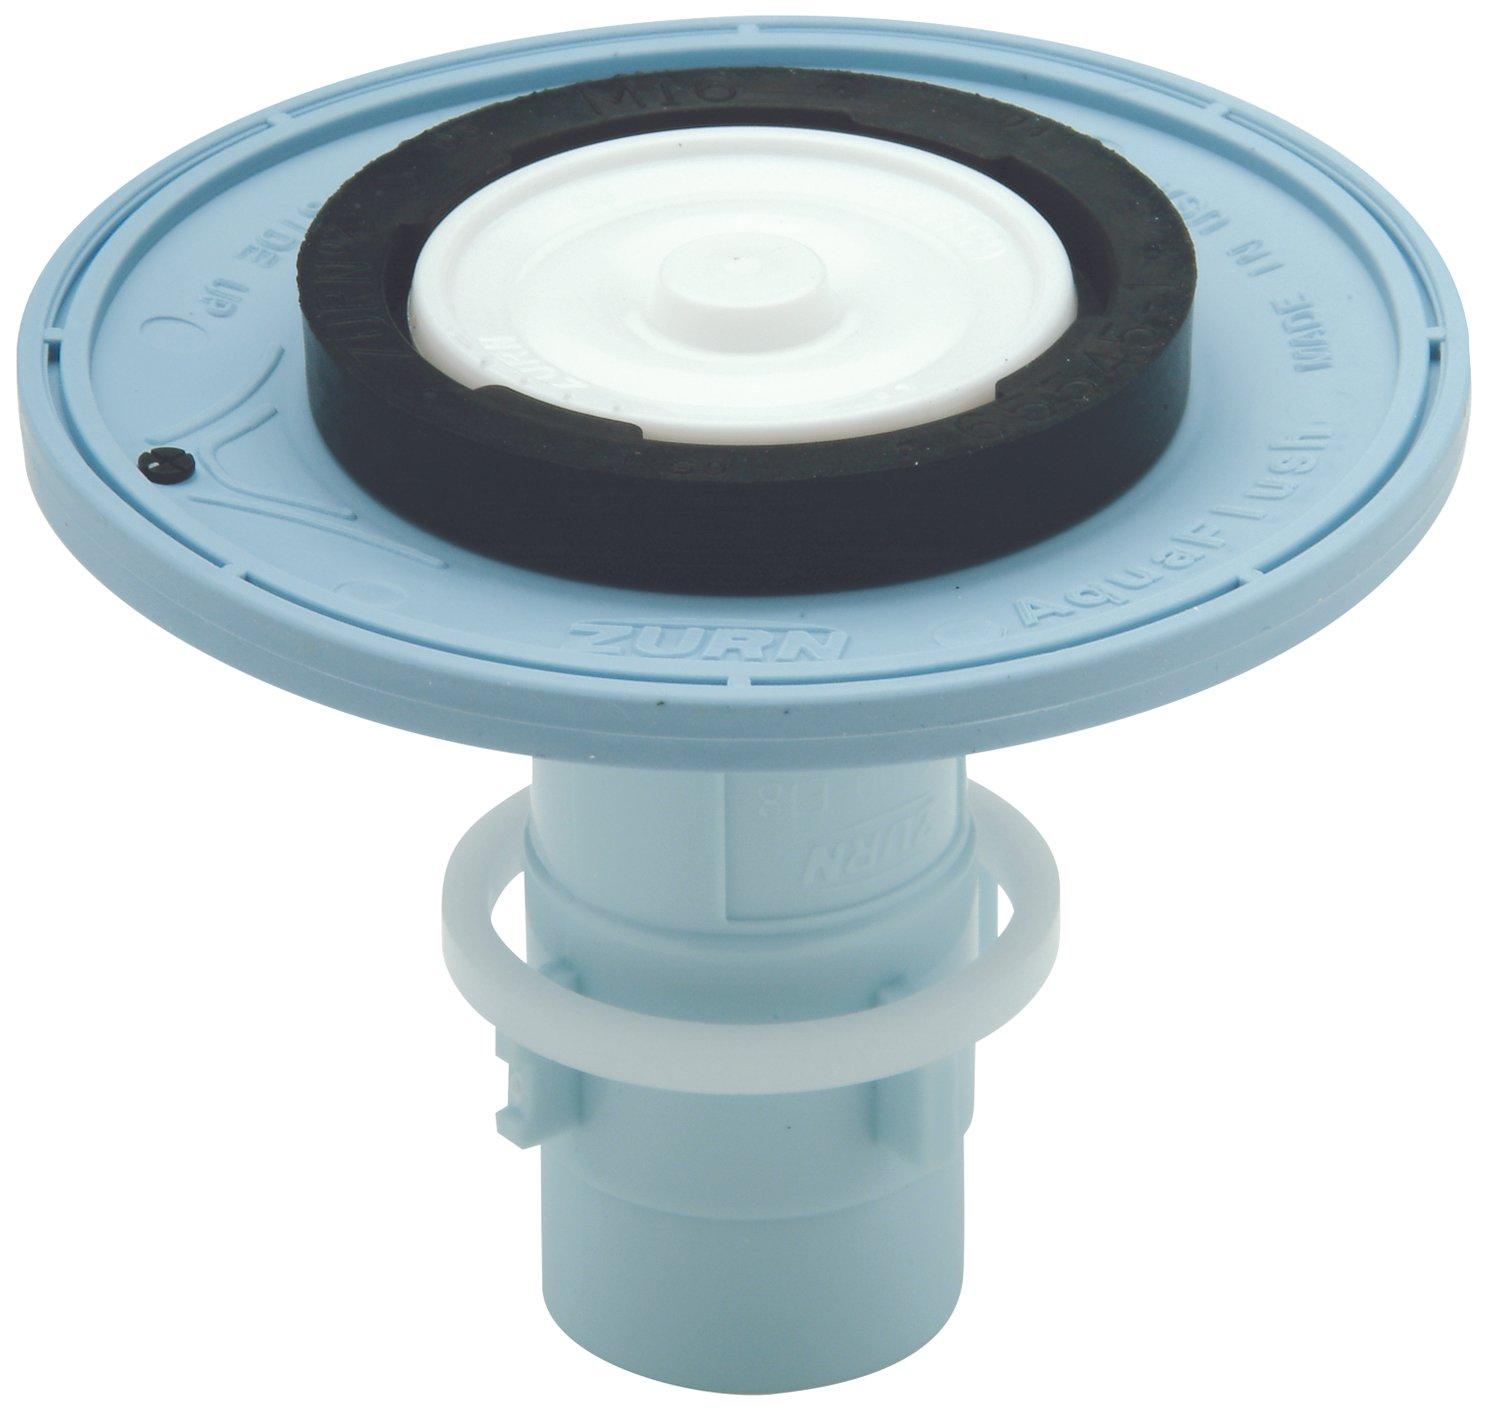 Zurn P6000-ECR-WS1 1.6--Gallon Aquaflush Closet Repair Kit by Zurn